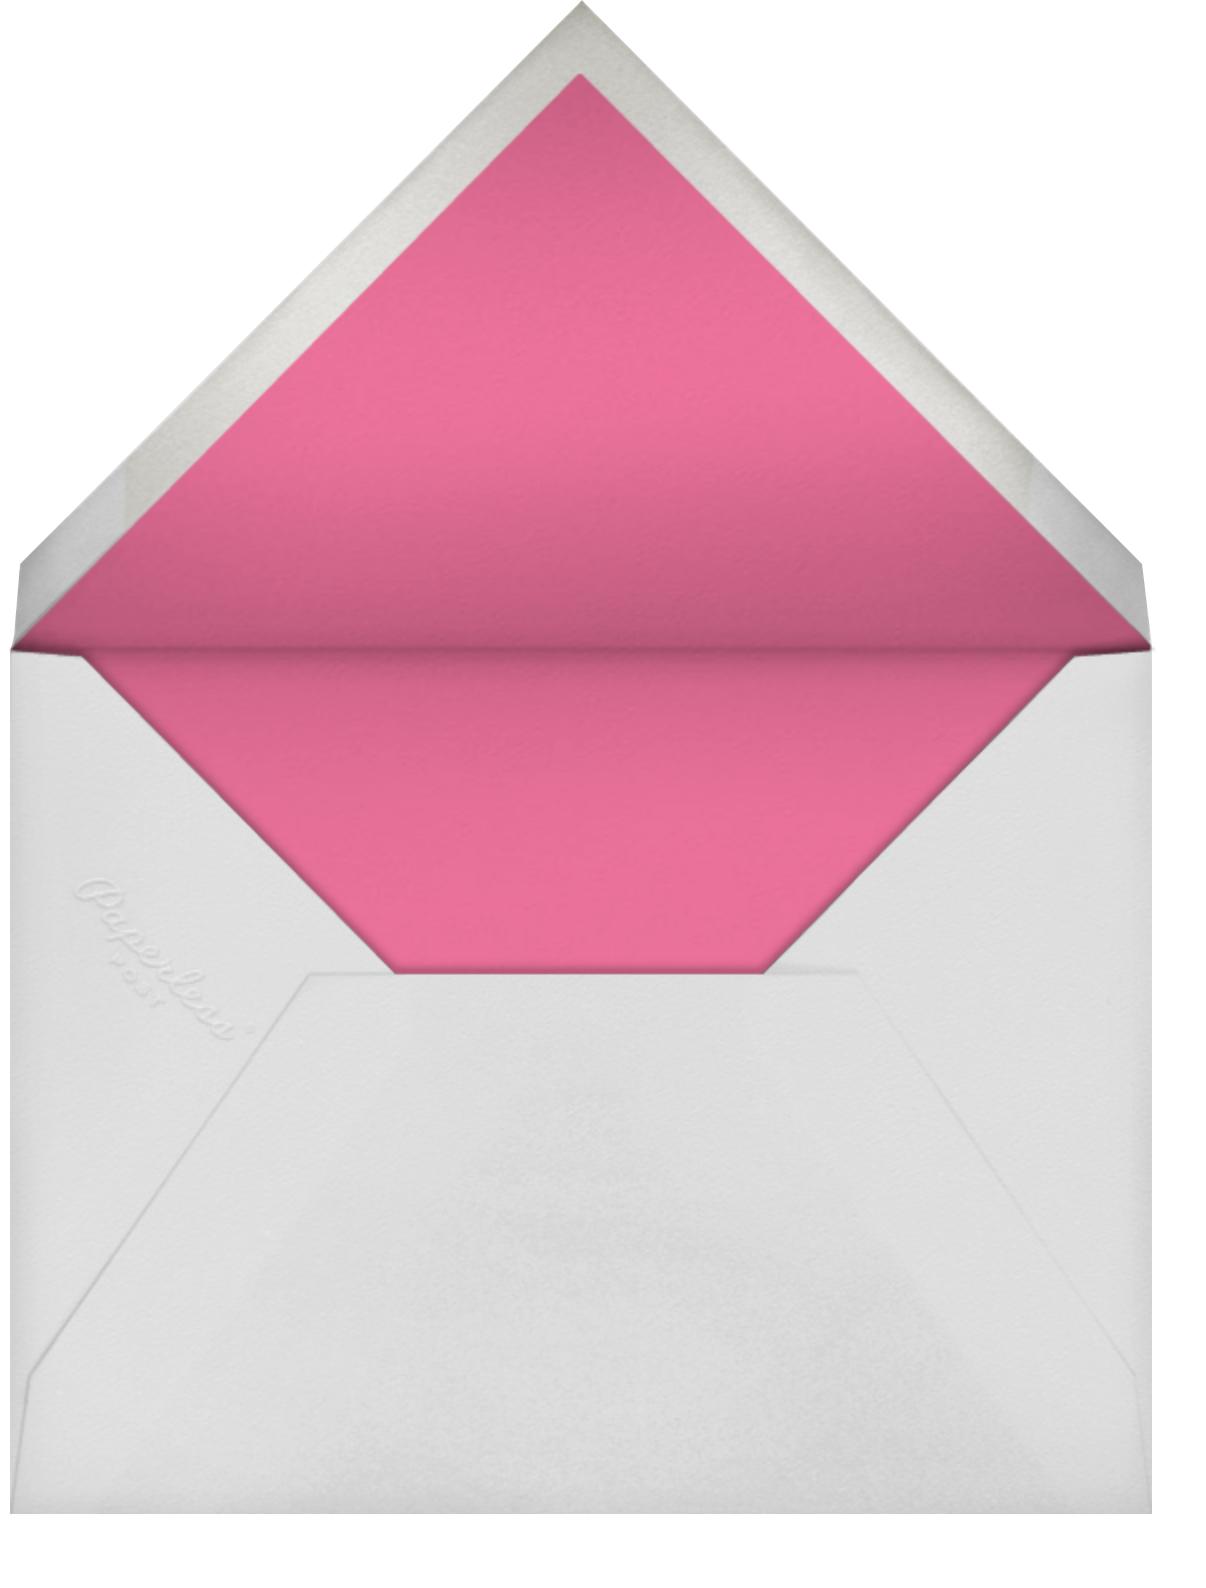 Long Stems - Raspberry - kate spade new york - Birthday - envelope back